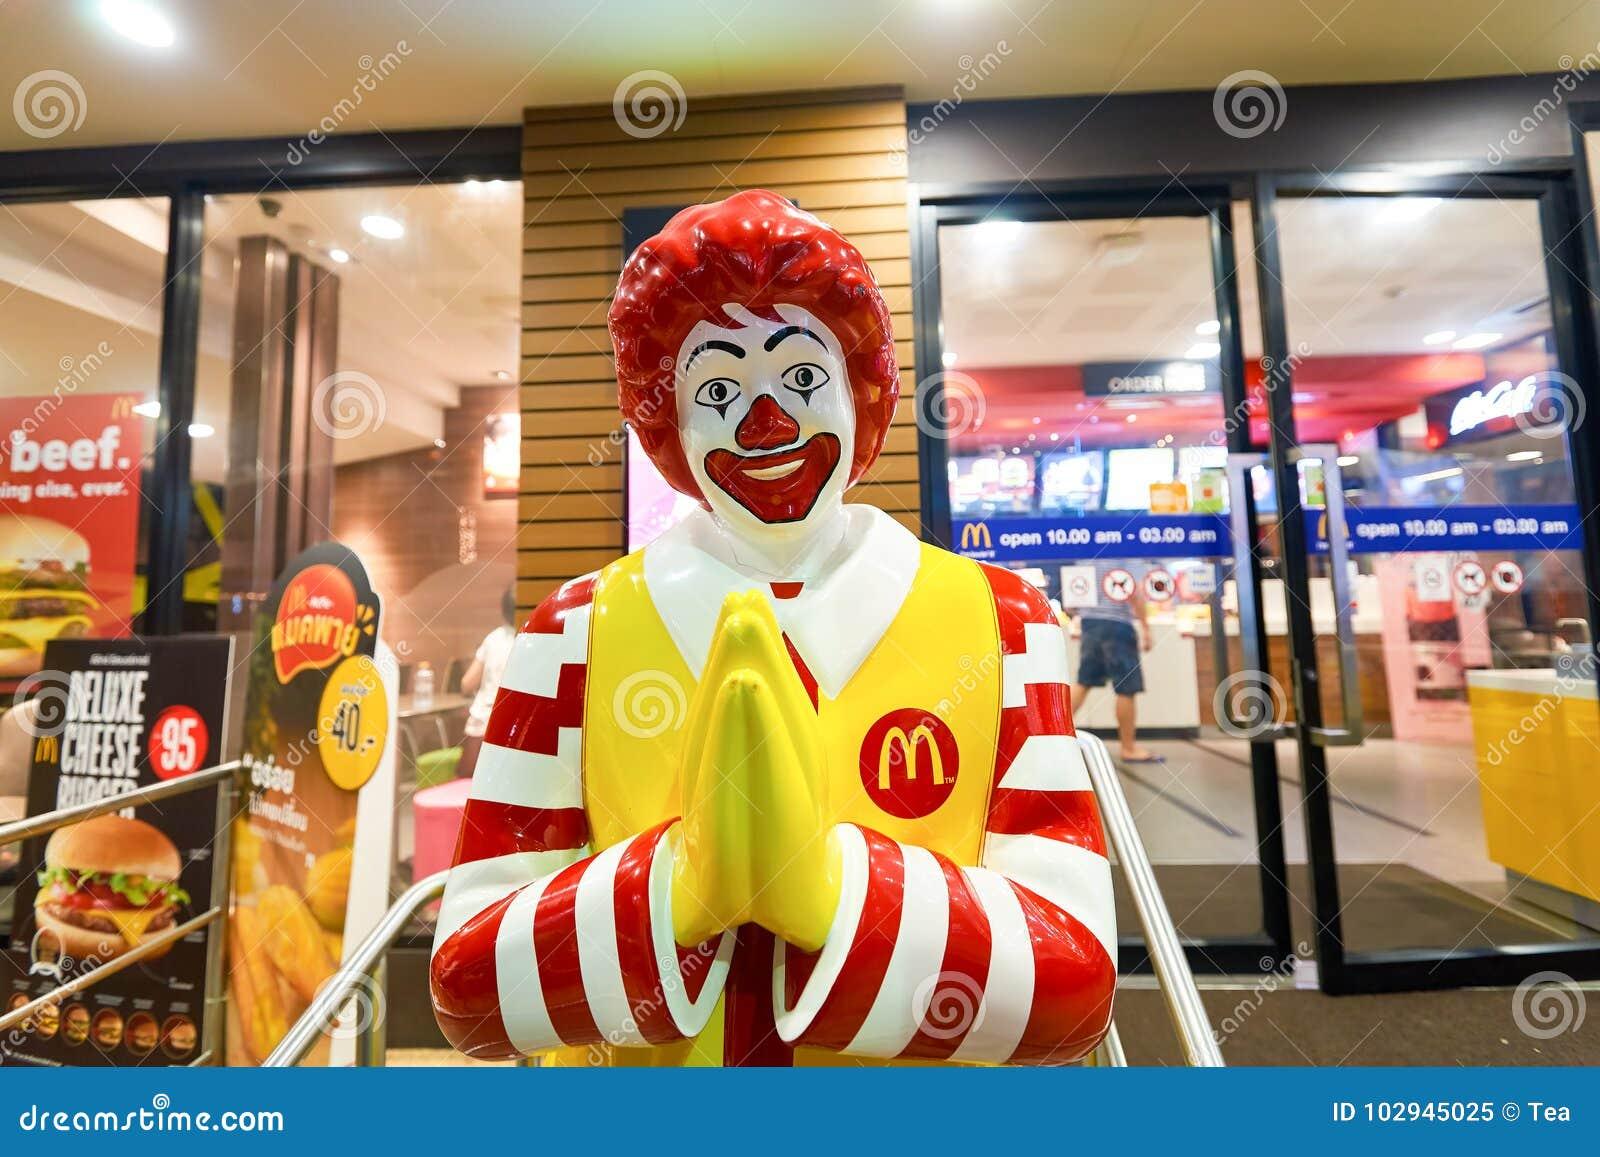 Mcdonald-Restaurant